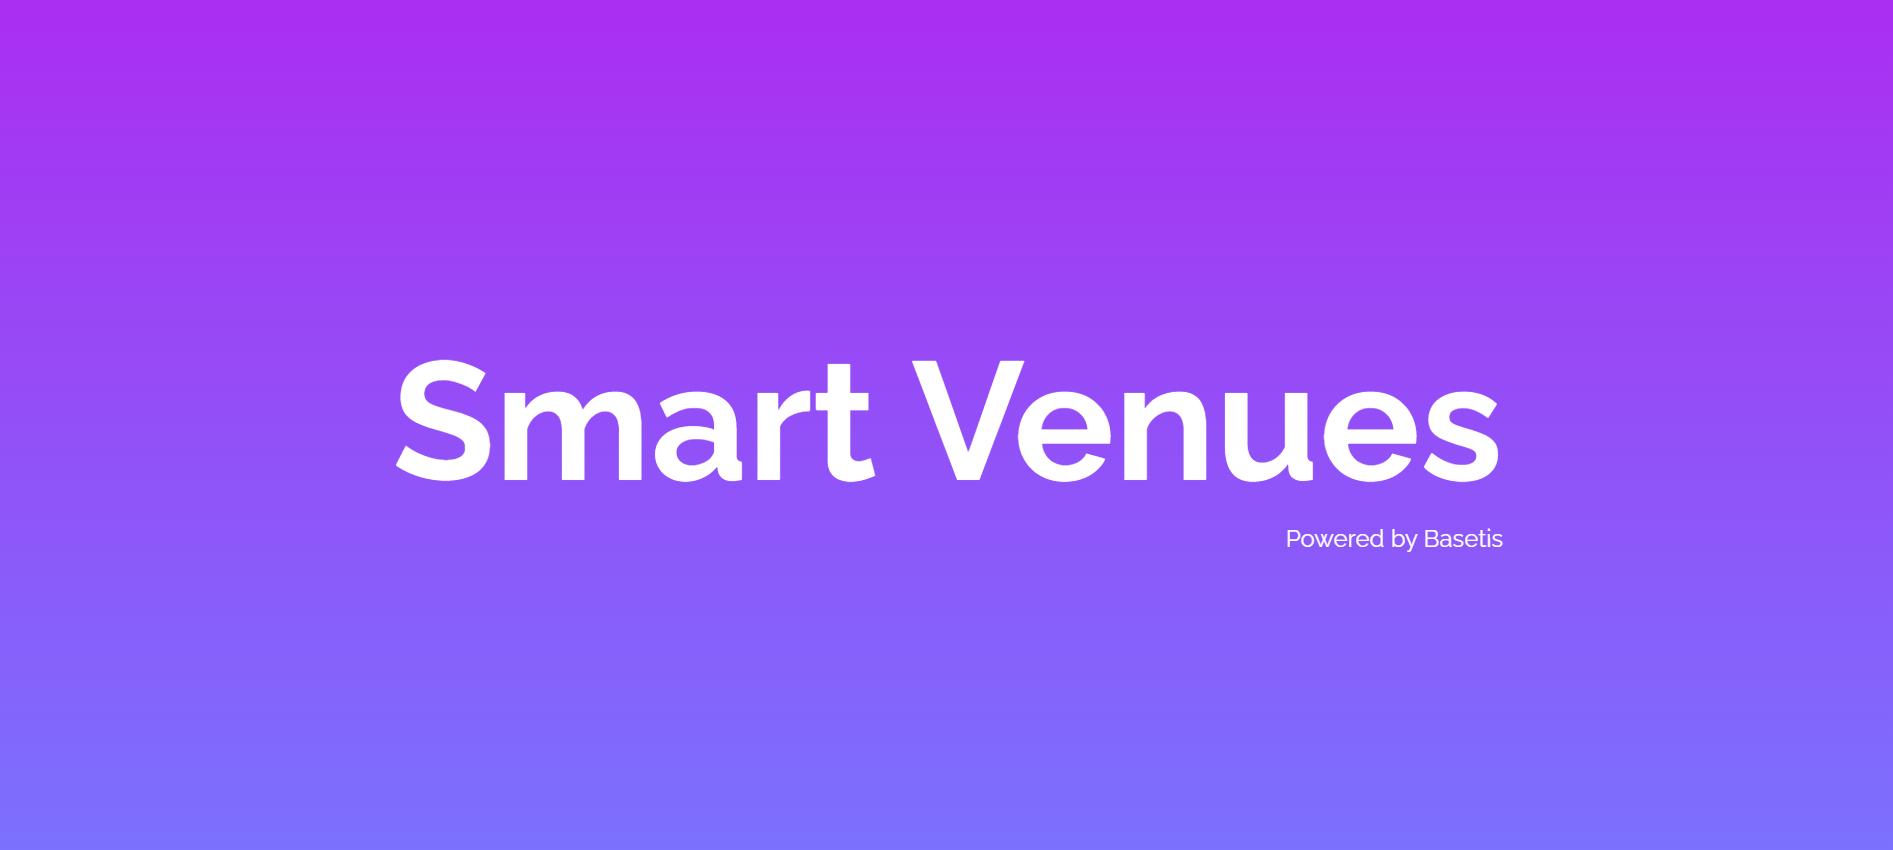 Smart Venues, for a smart seat allocation